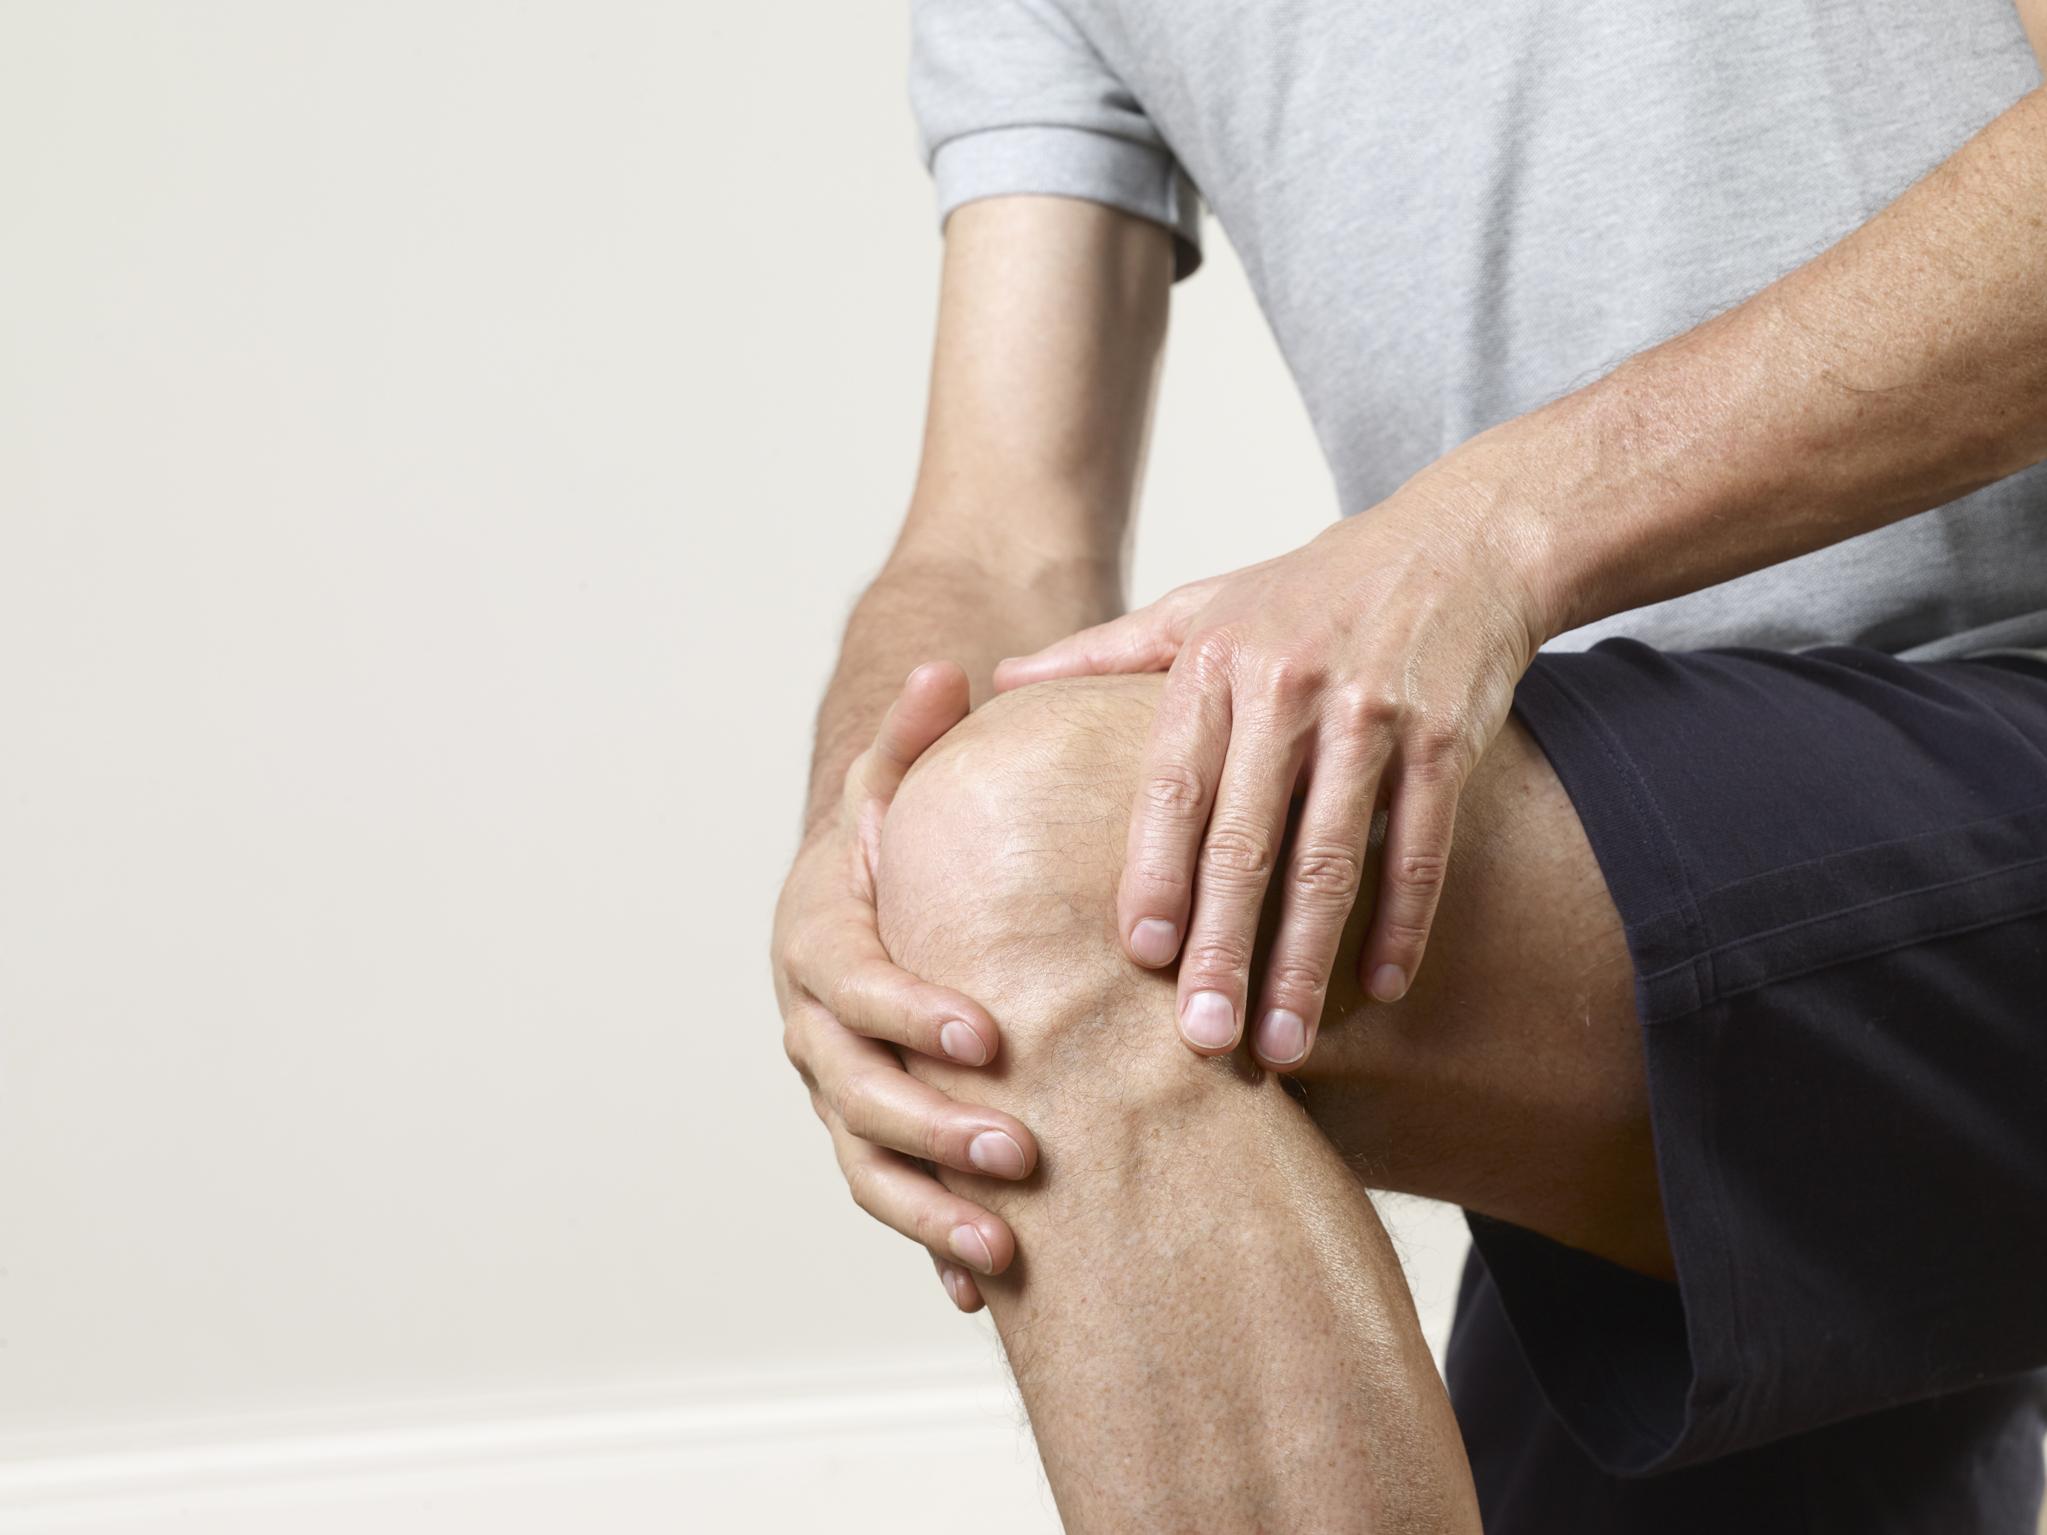 Реабилитация после артрита коленного сустава что вредно суставам кисти